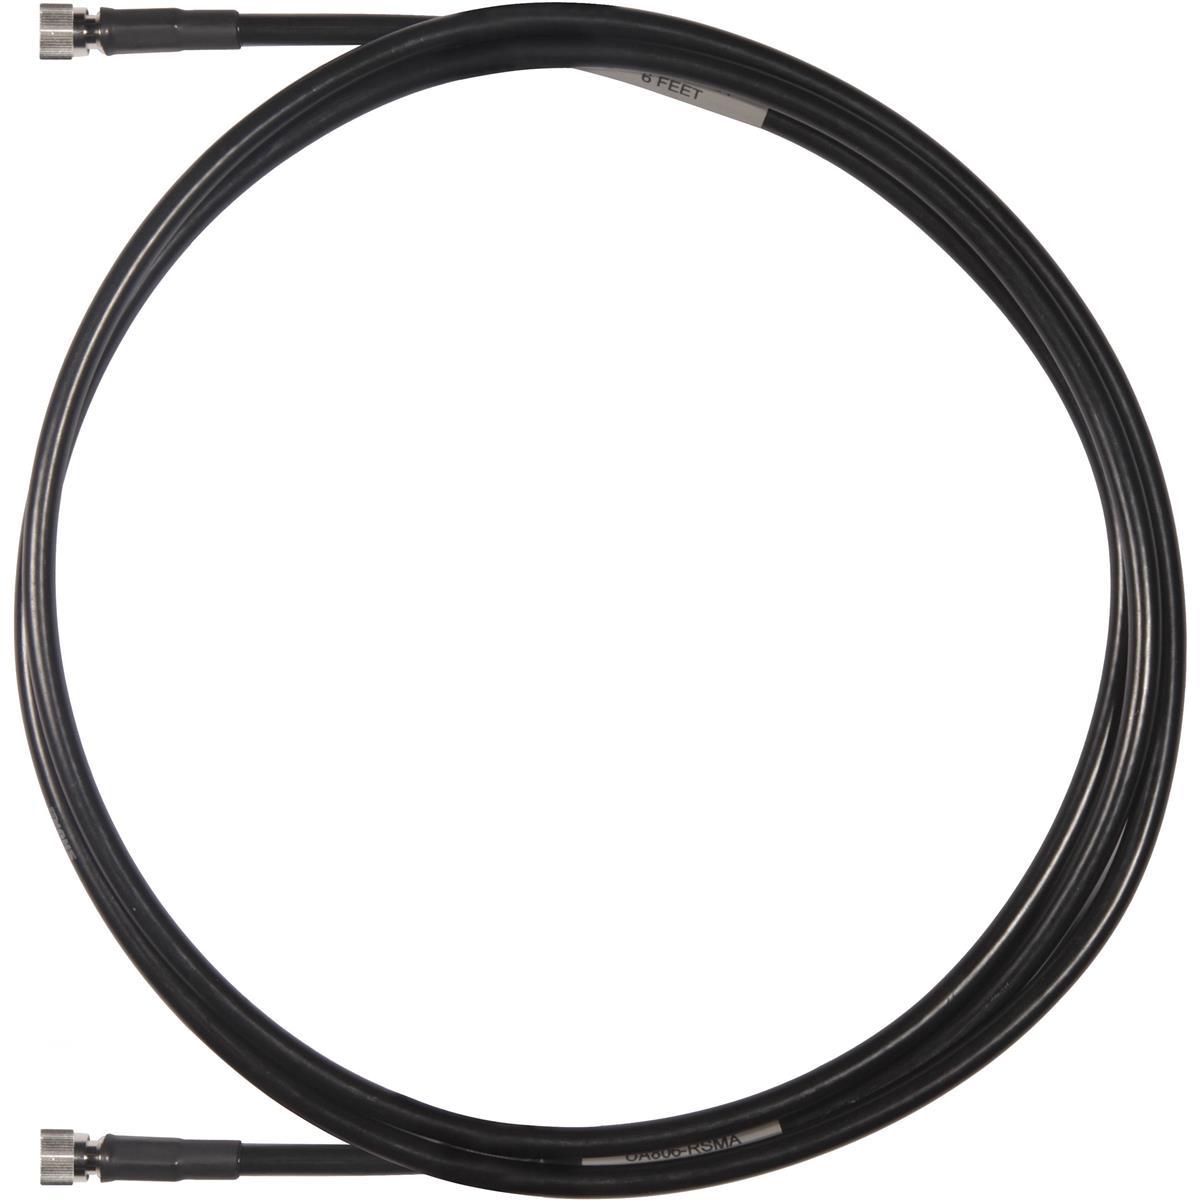 Shure UA802-RSMA 2ft (0.6m) Reverse SMA Cable GLXD